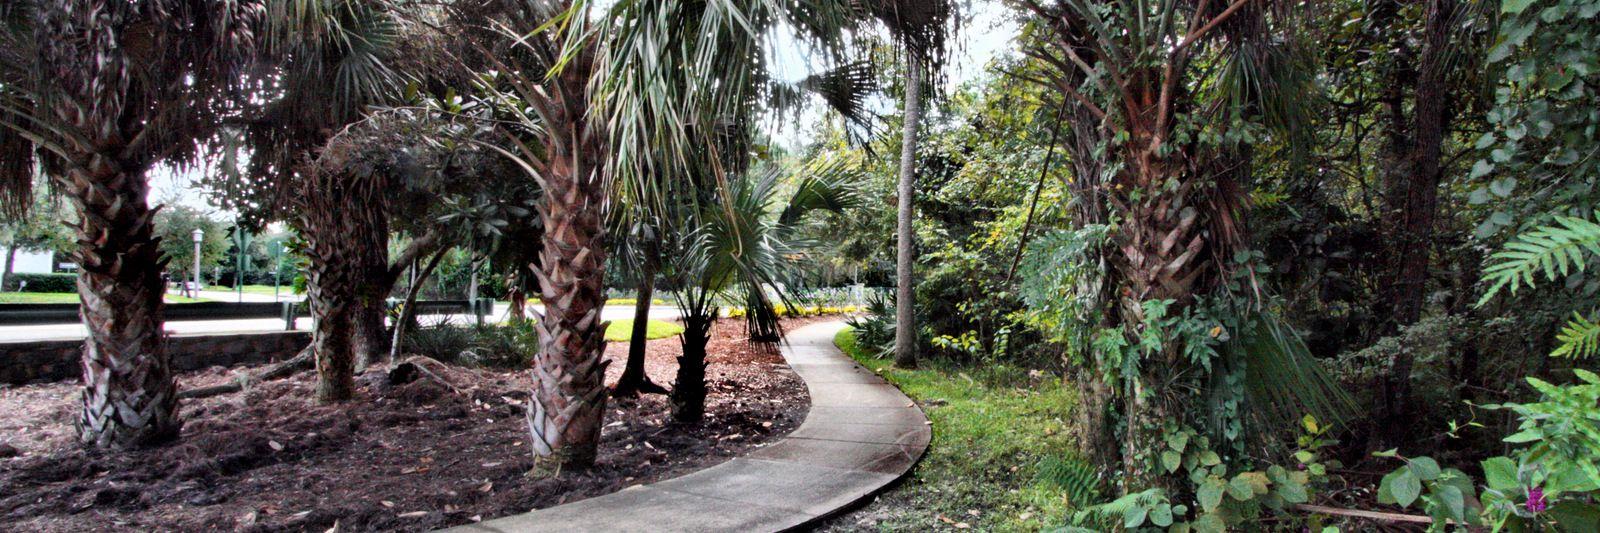 scenic trails through the neighborhood